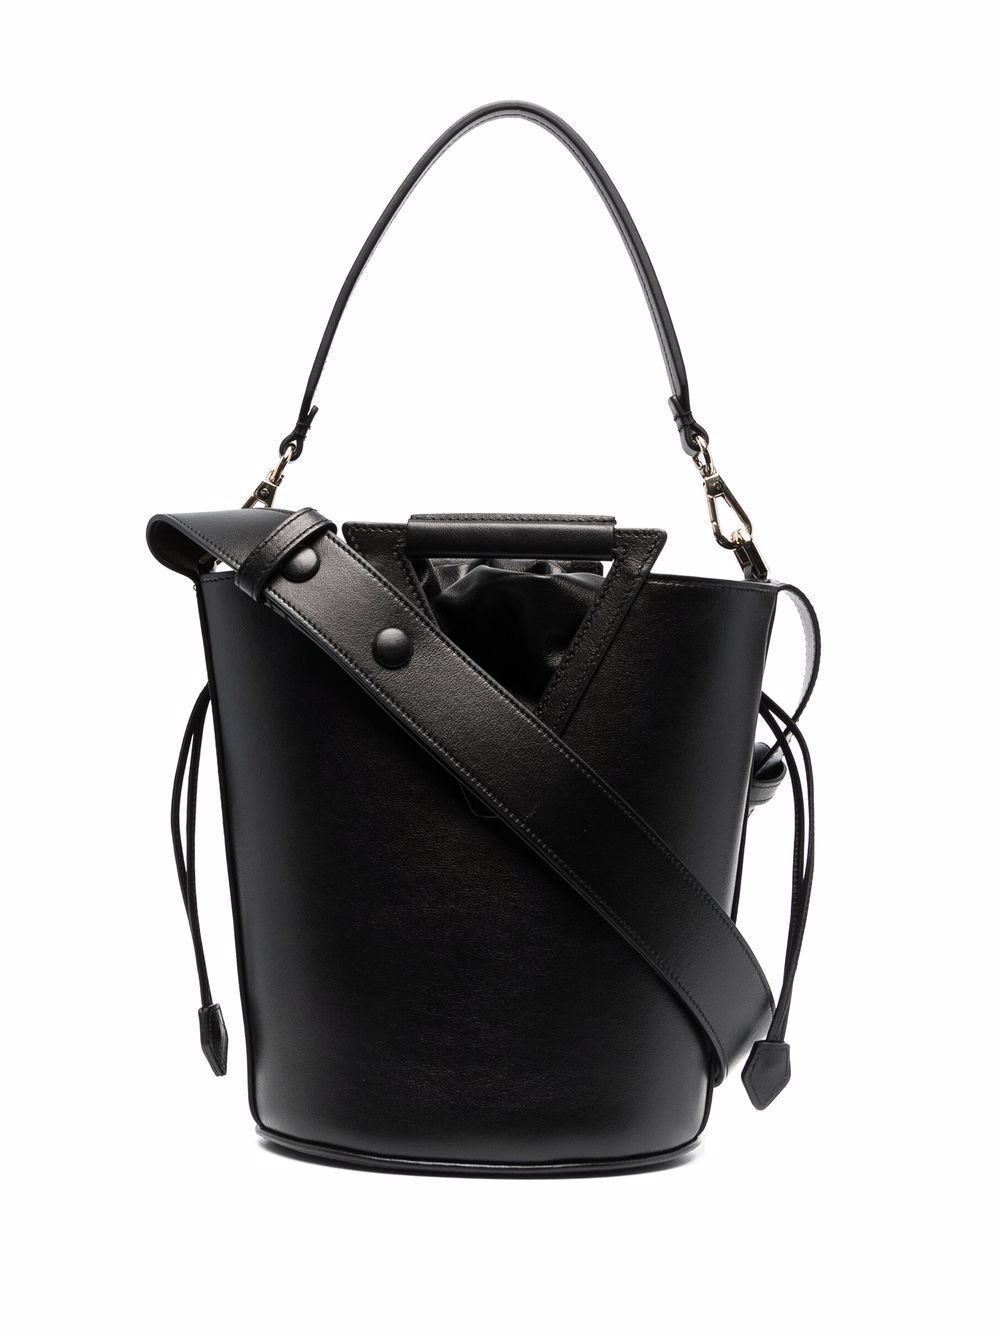 Roger vivier bags.. black